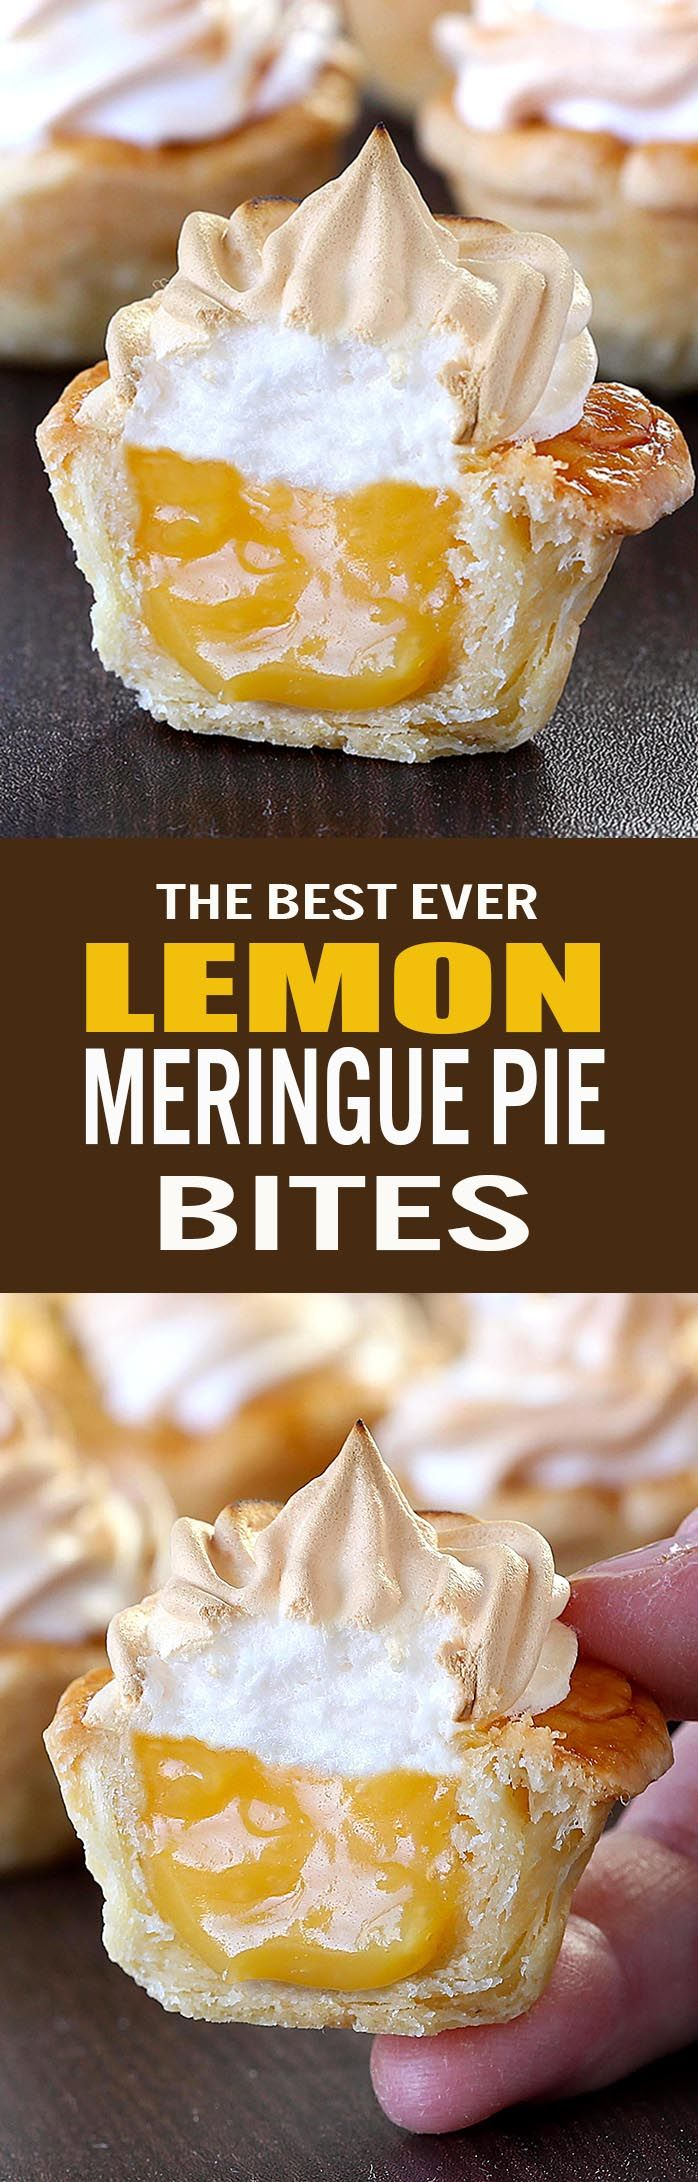 Lemon Meringue Pie Bites | Recipe | Homemade, Lemon meringue pie and ...